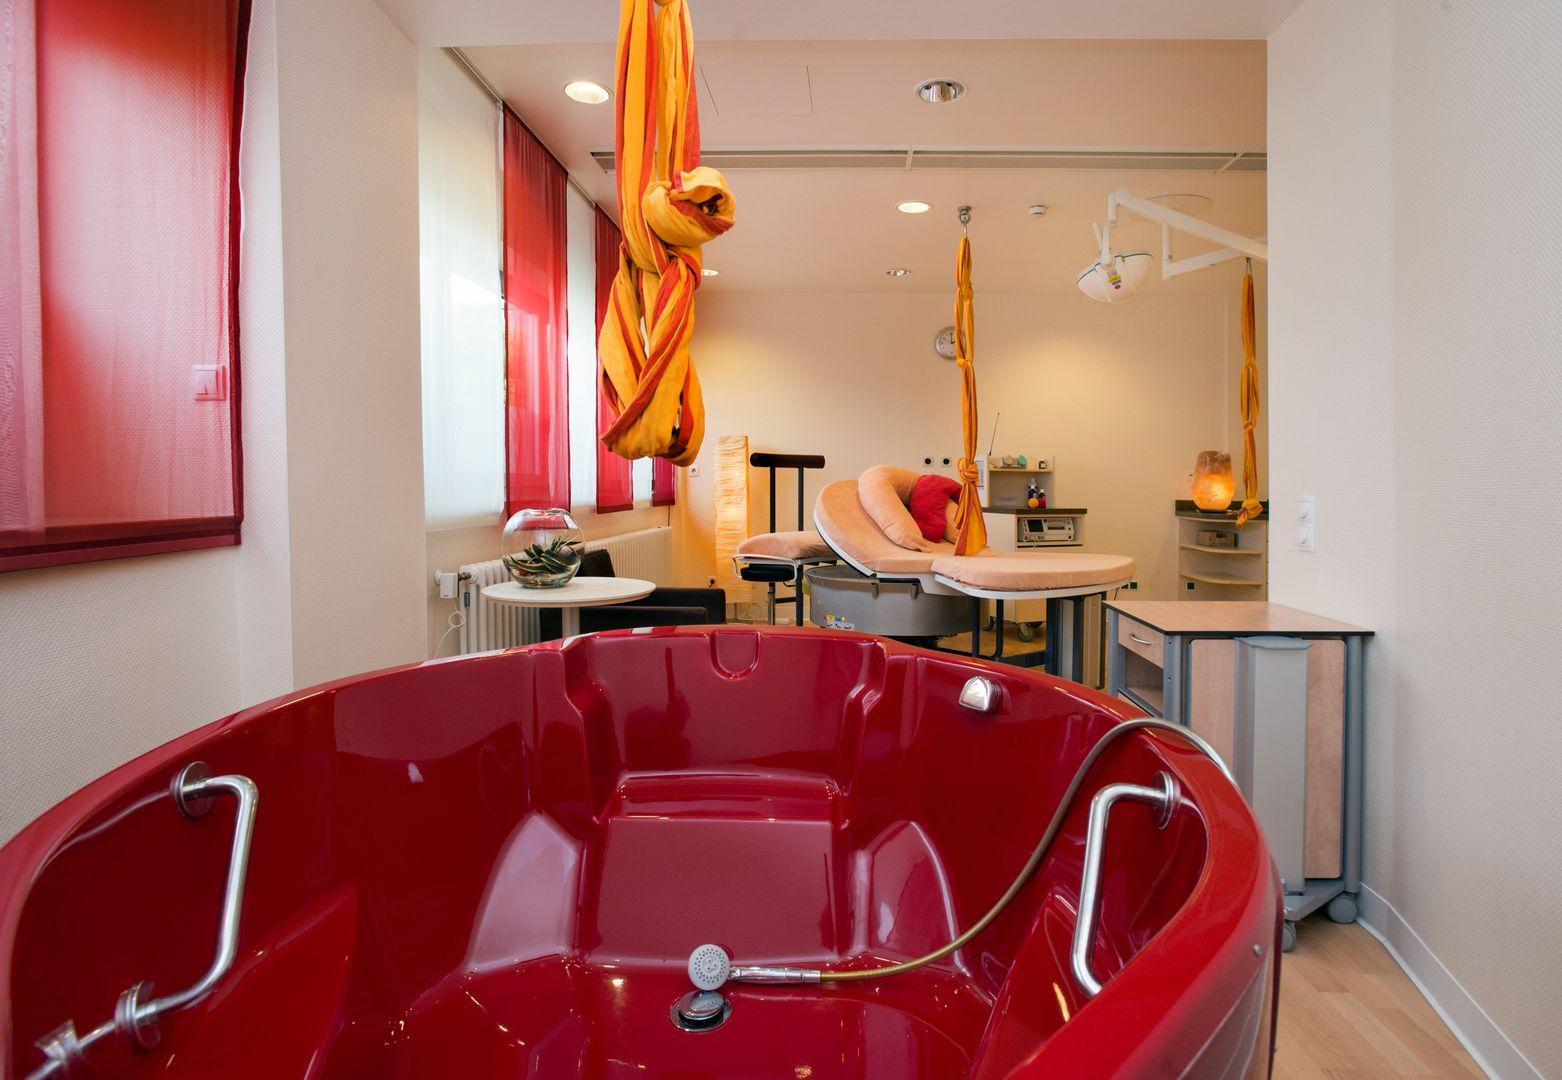 krei saalf hrung gyn kologie und geburtshilfe. Black Bedroom Furniture Sets. Home Design Ideas